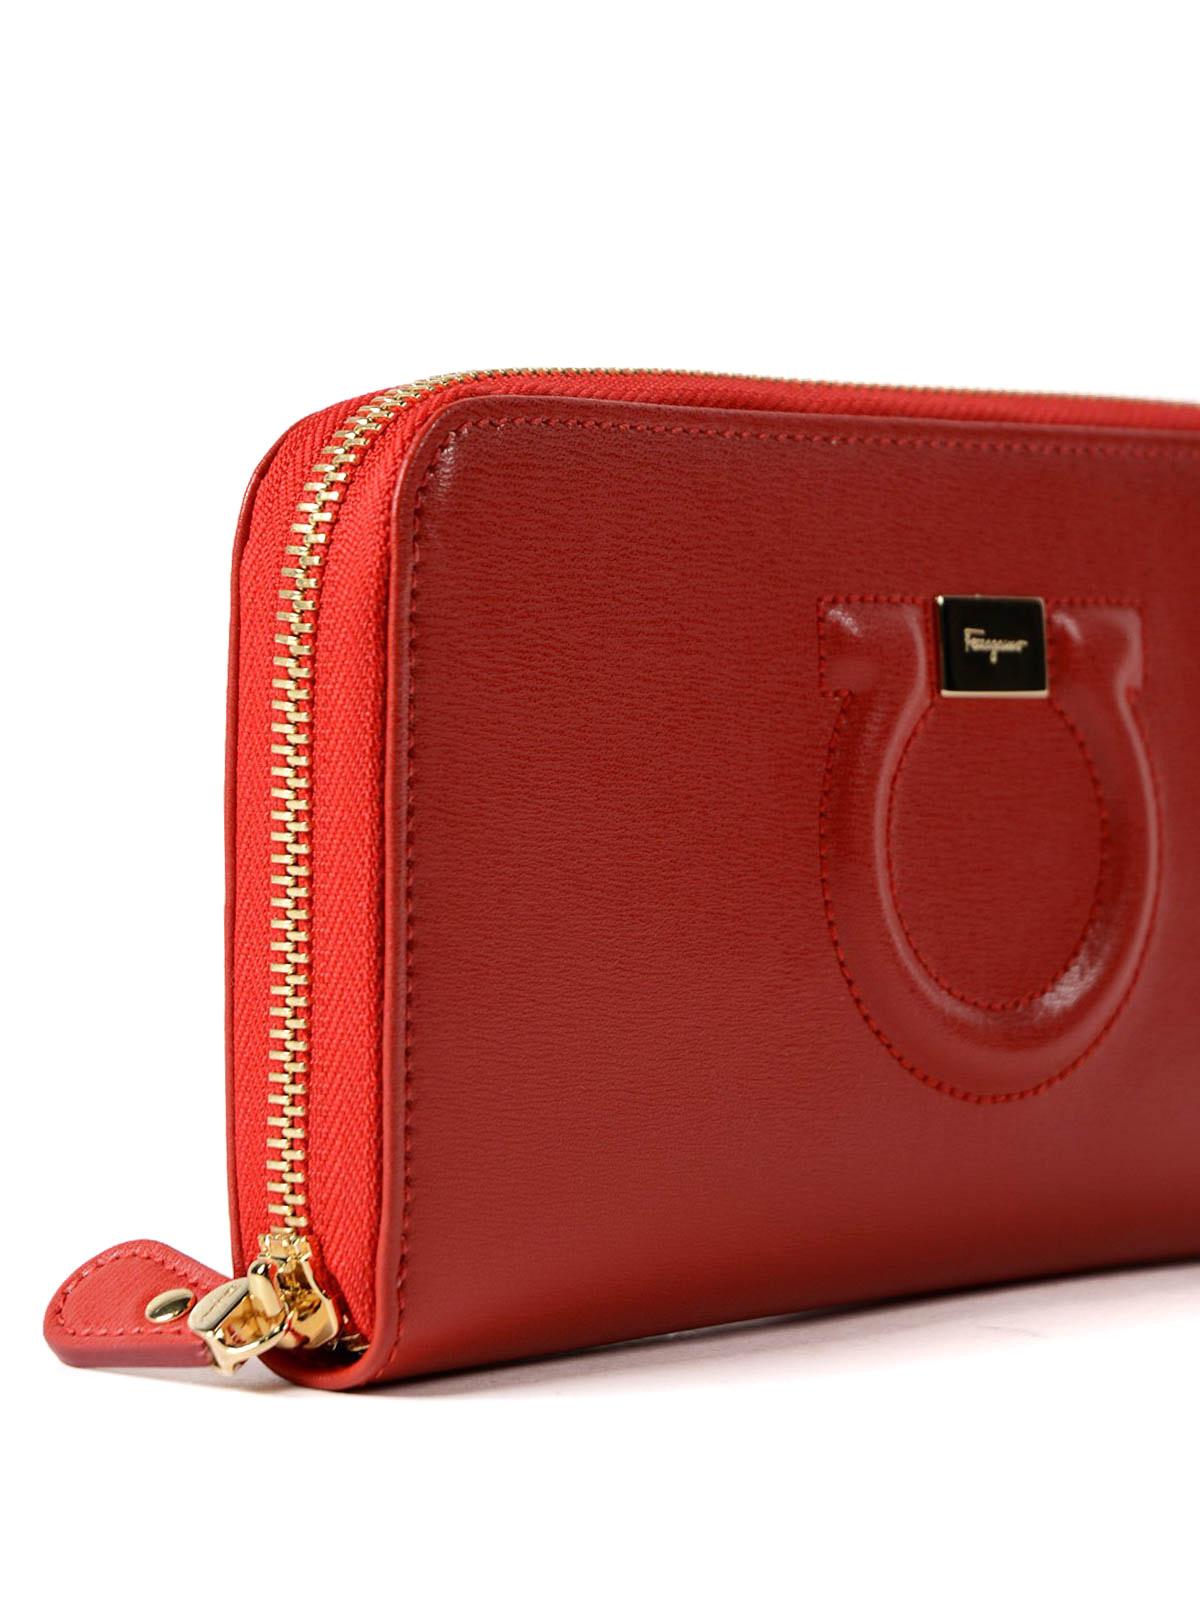 1a7f34a6c1c41 Salvatore Ferragamo - Gancini leather continental wallet - wallets ...